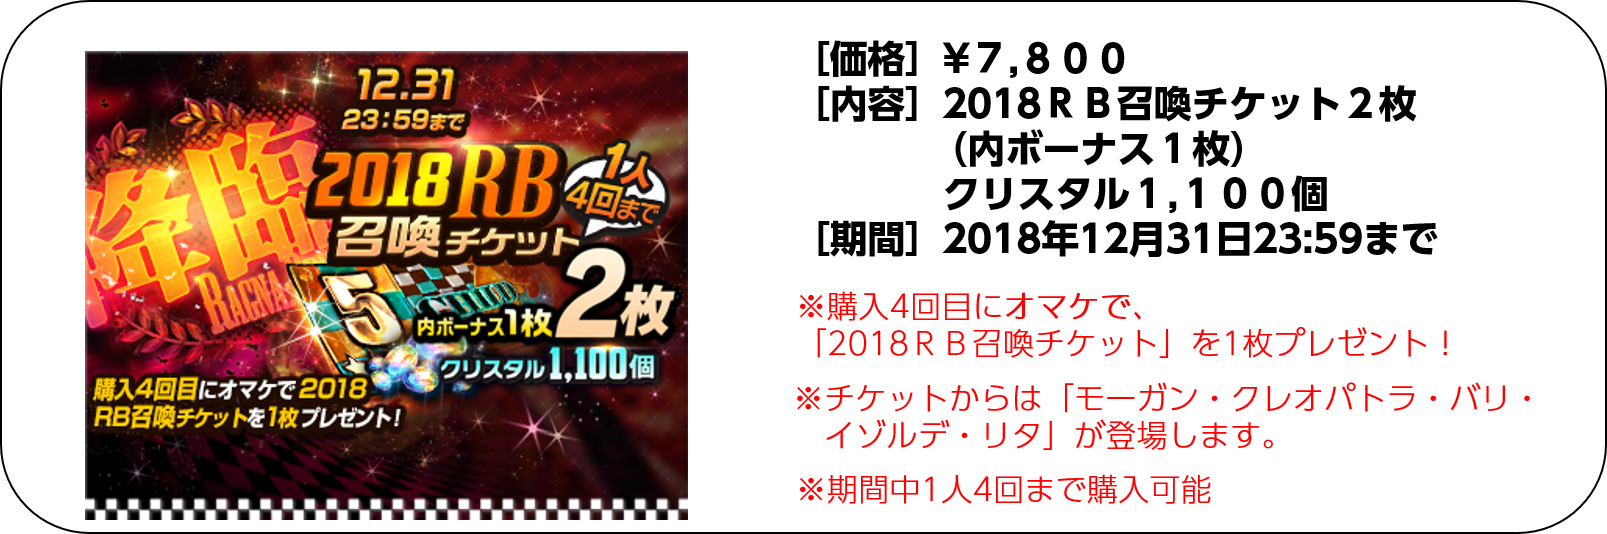 2018RB